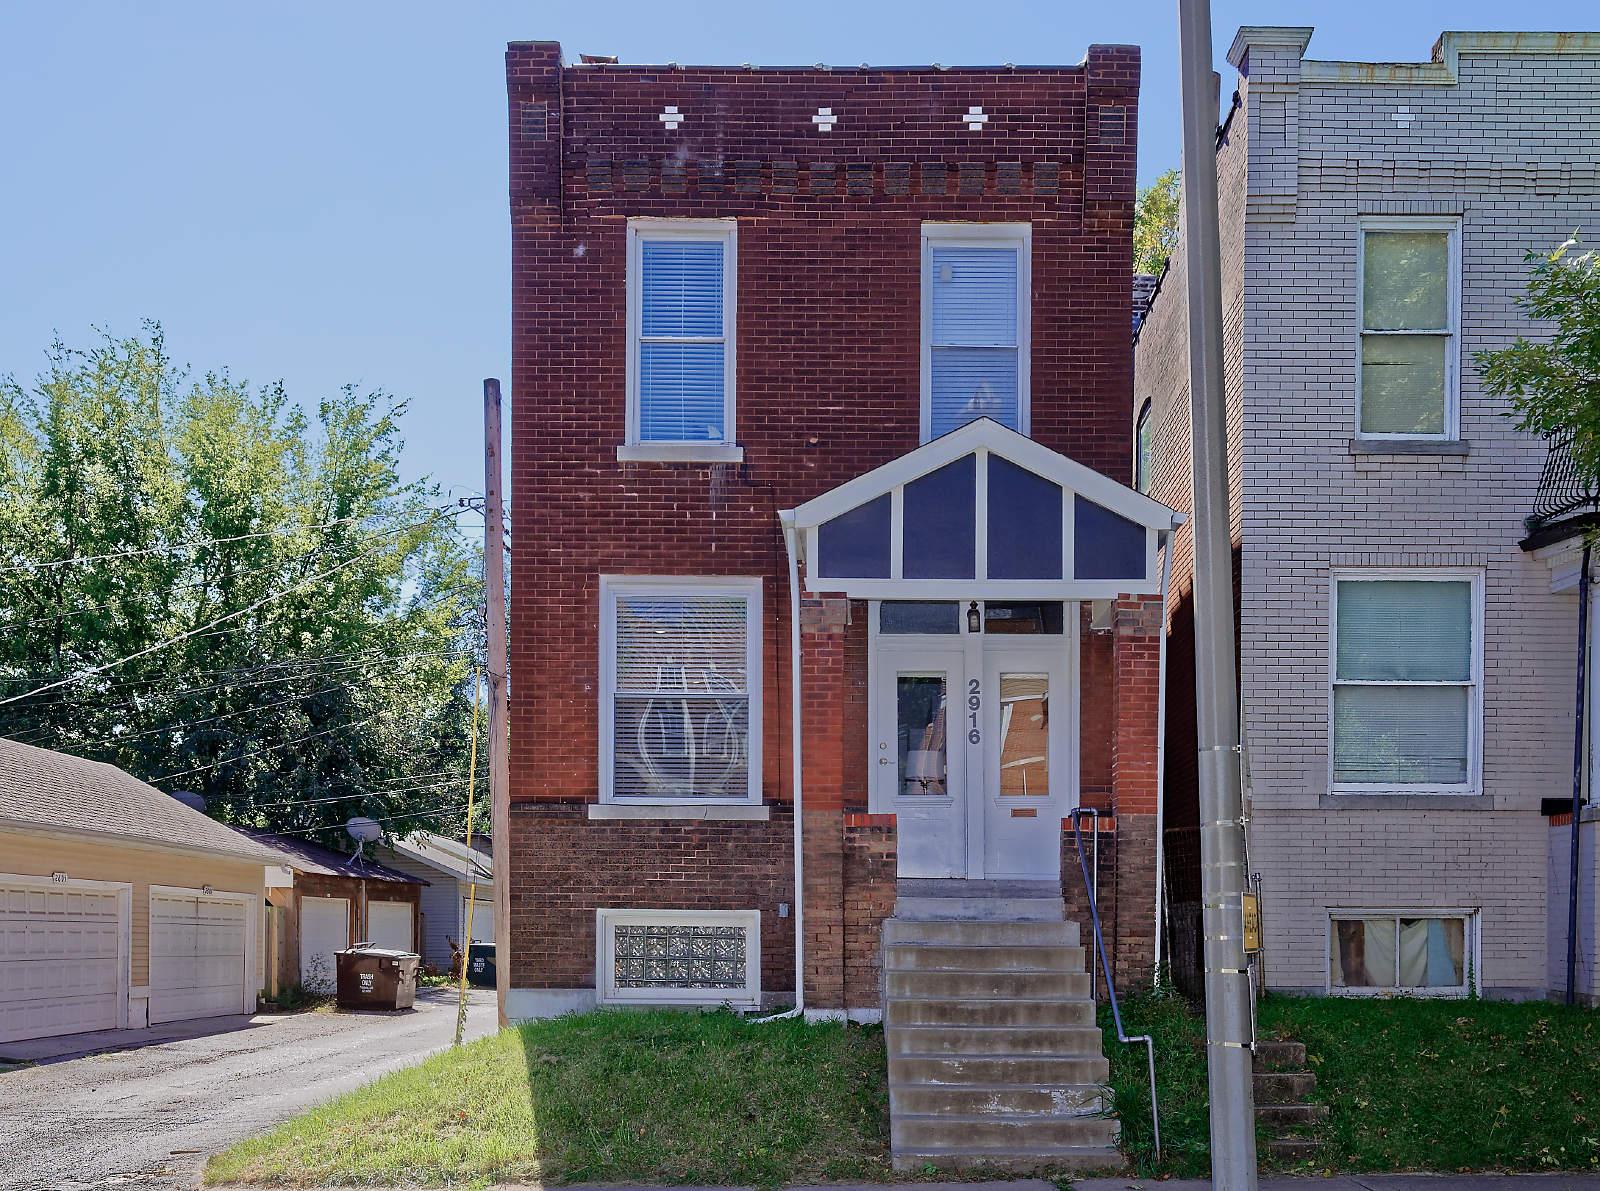 2916 Sidney St, St Louis 63104-1744